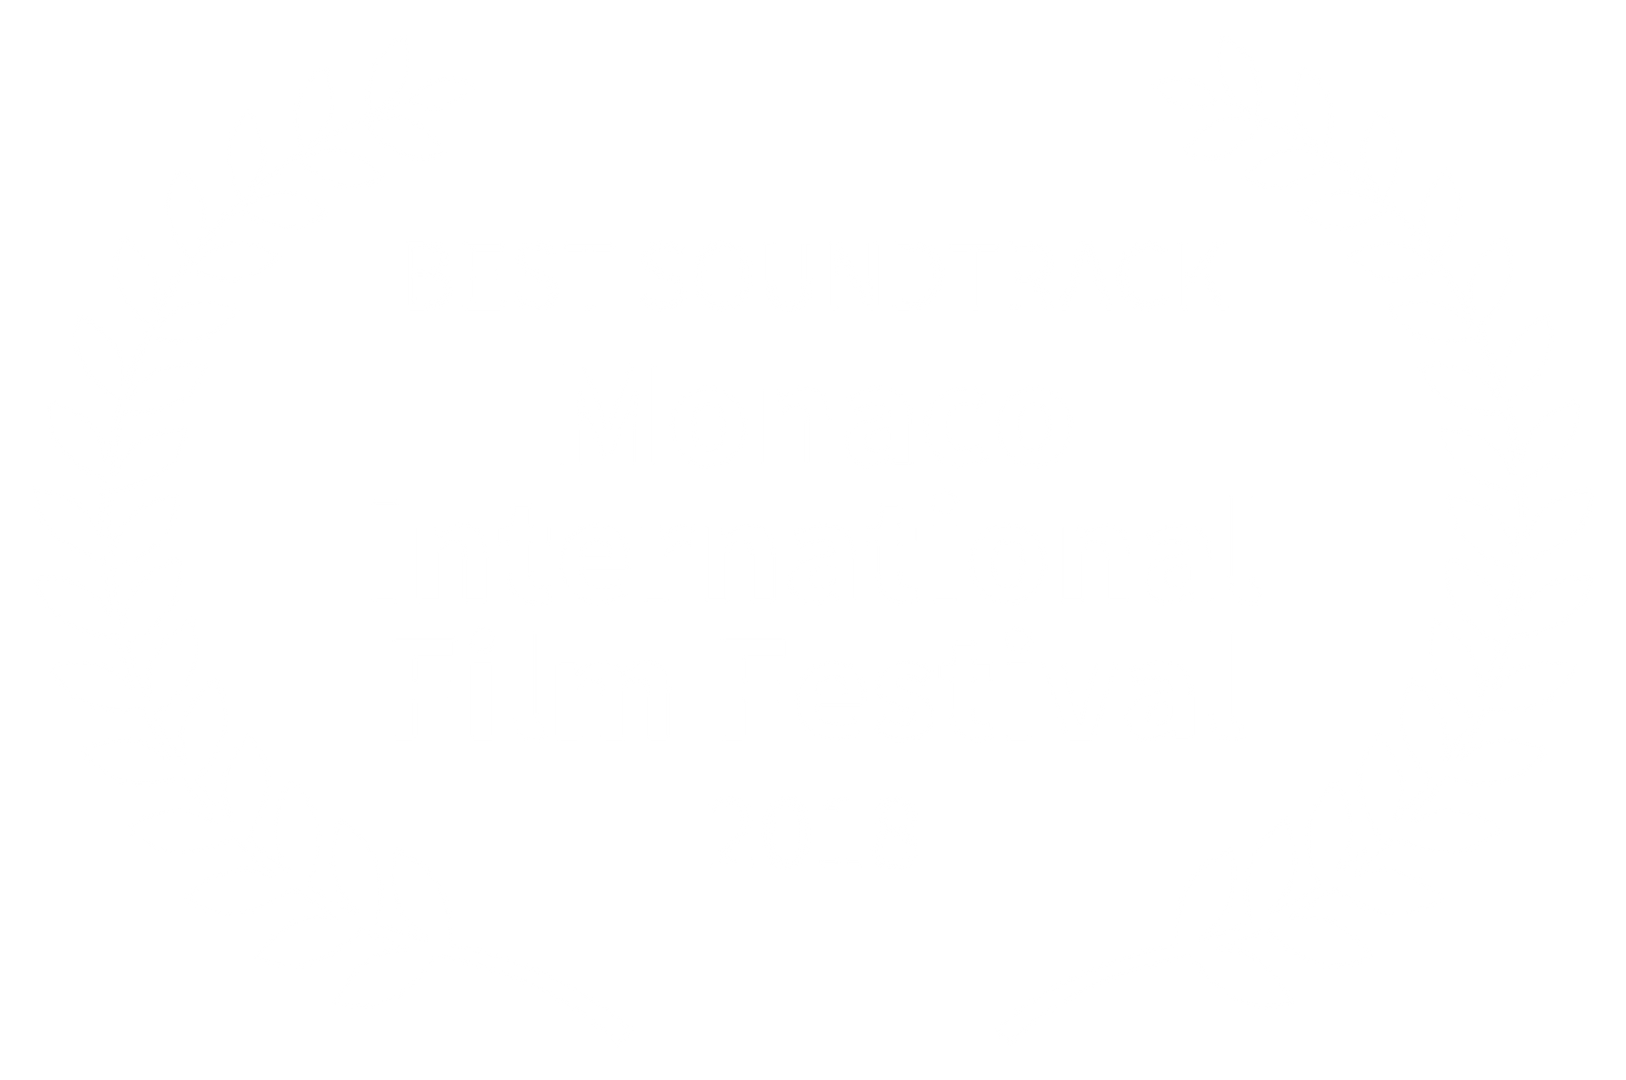 BEST SOUNDTRACK - Monaco International F